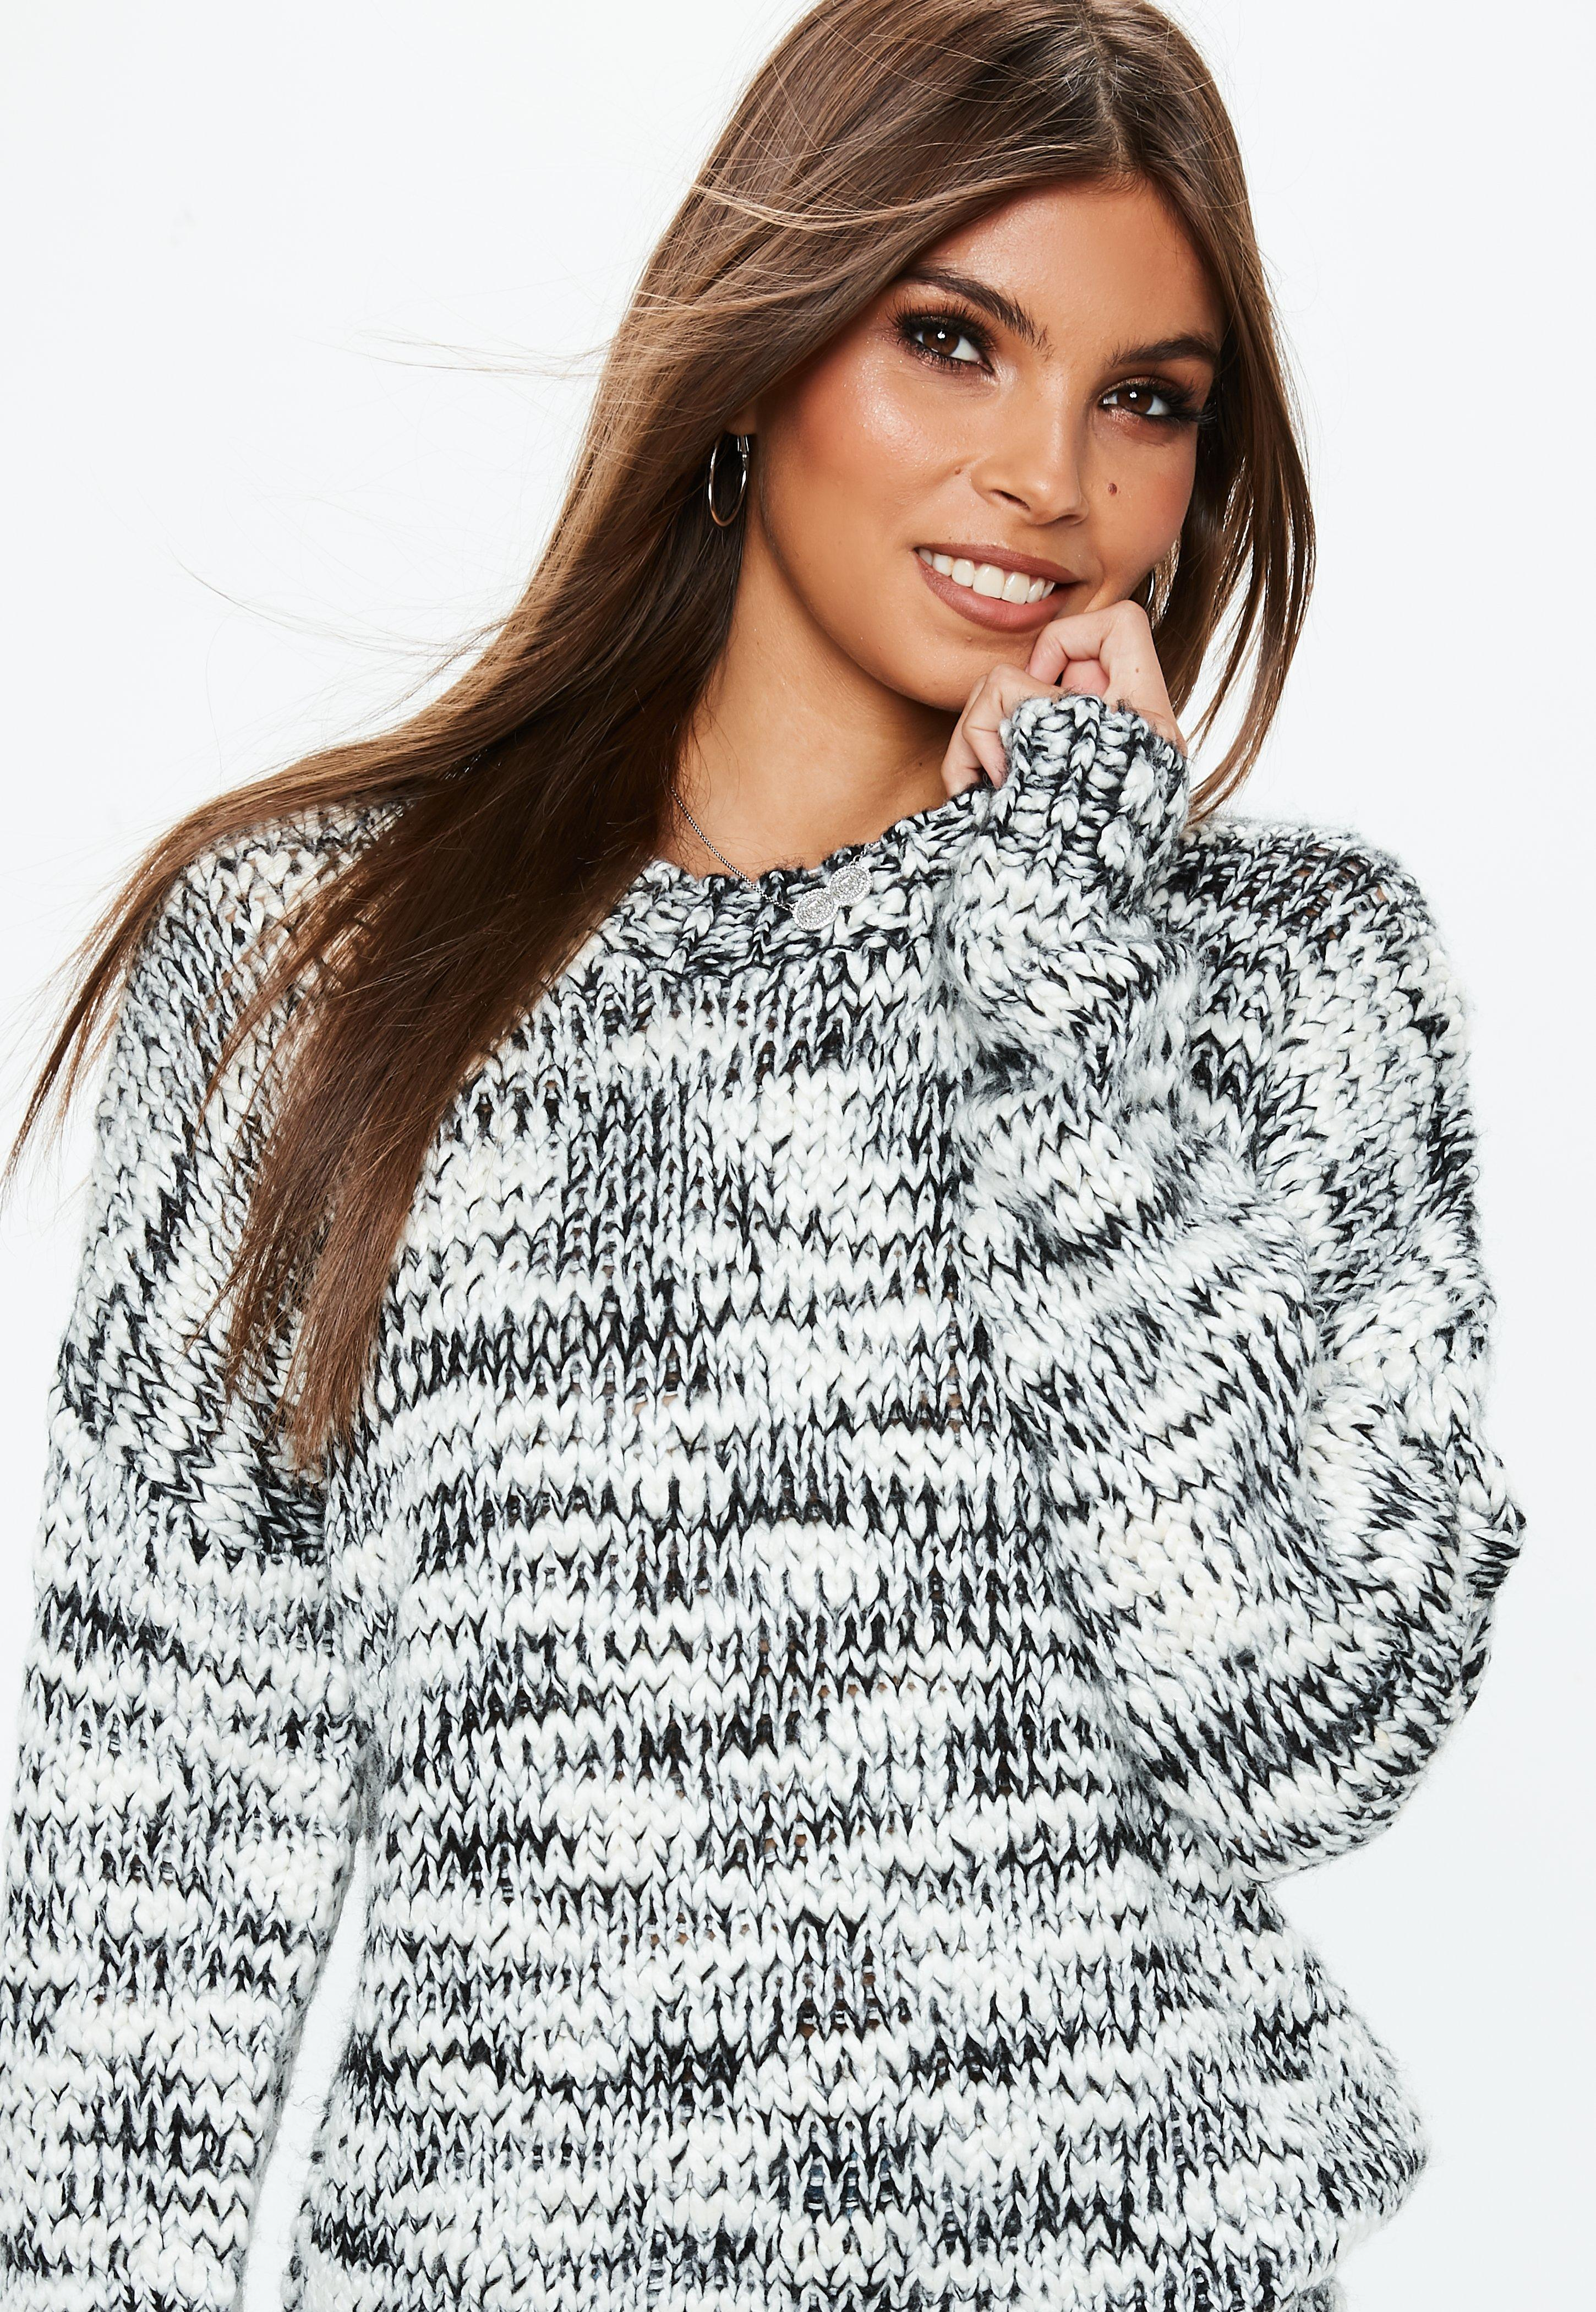 513d11f38d1ee1 ... Grey Chunky Knitted Boyfriend Sweater - Lyst. View fullscreen